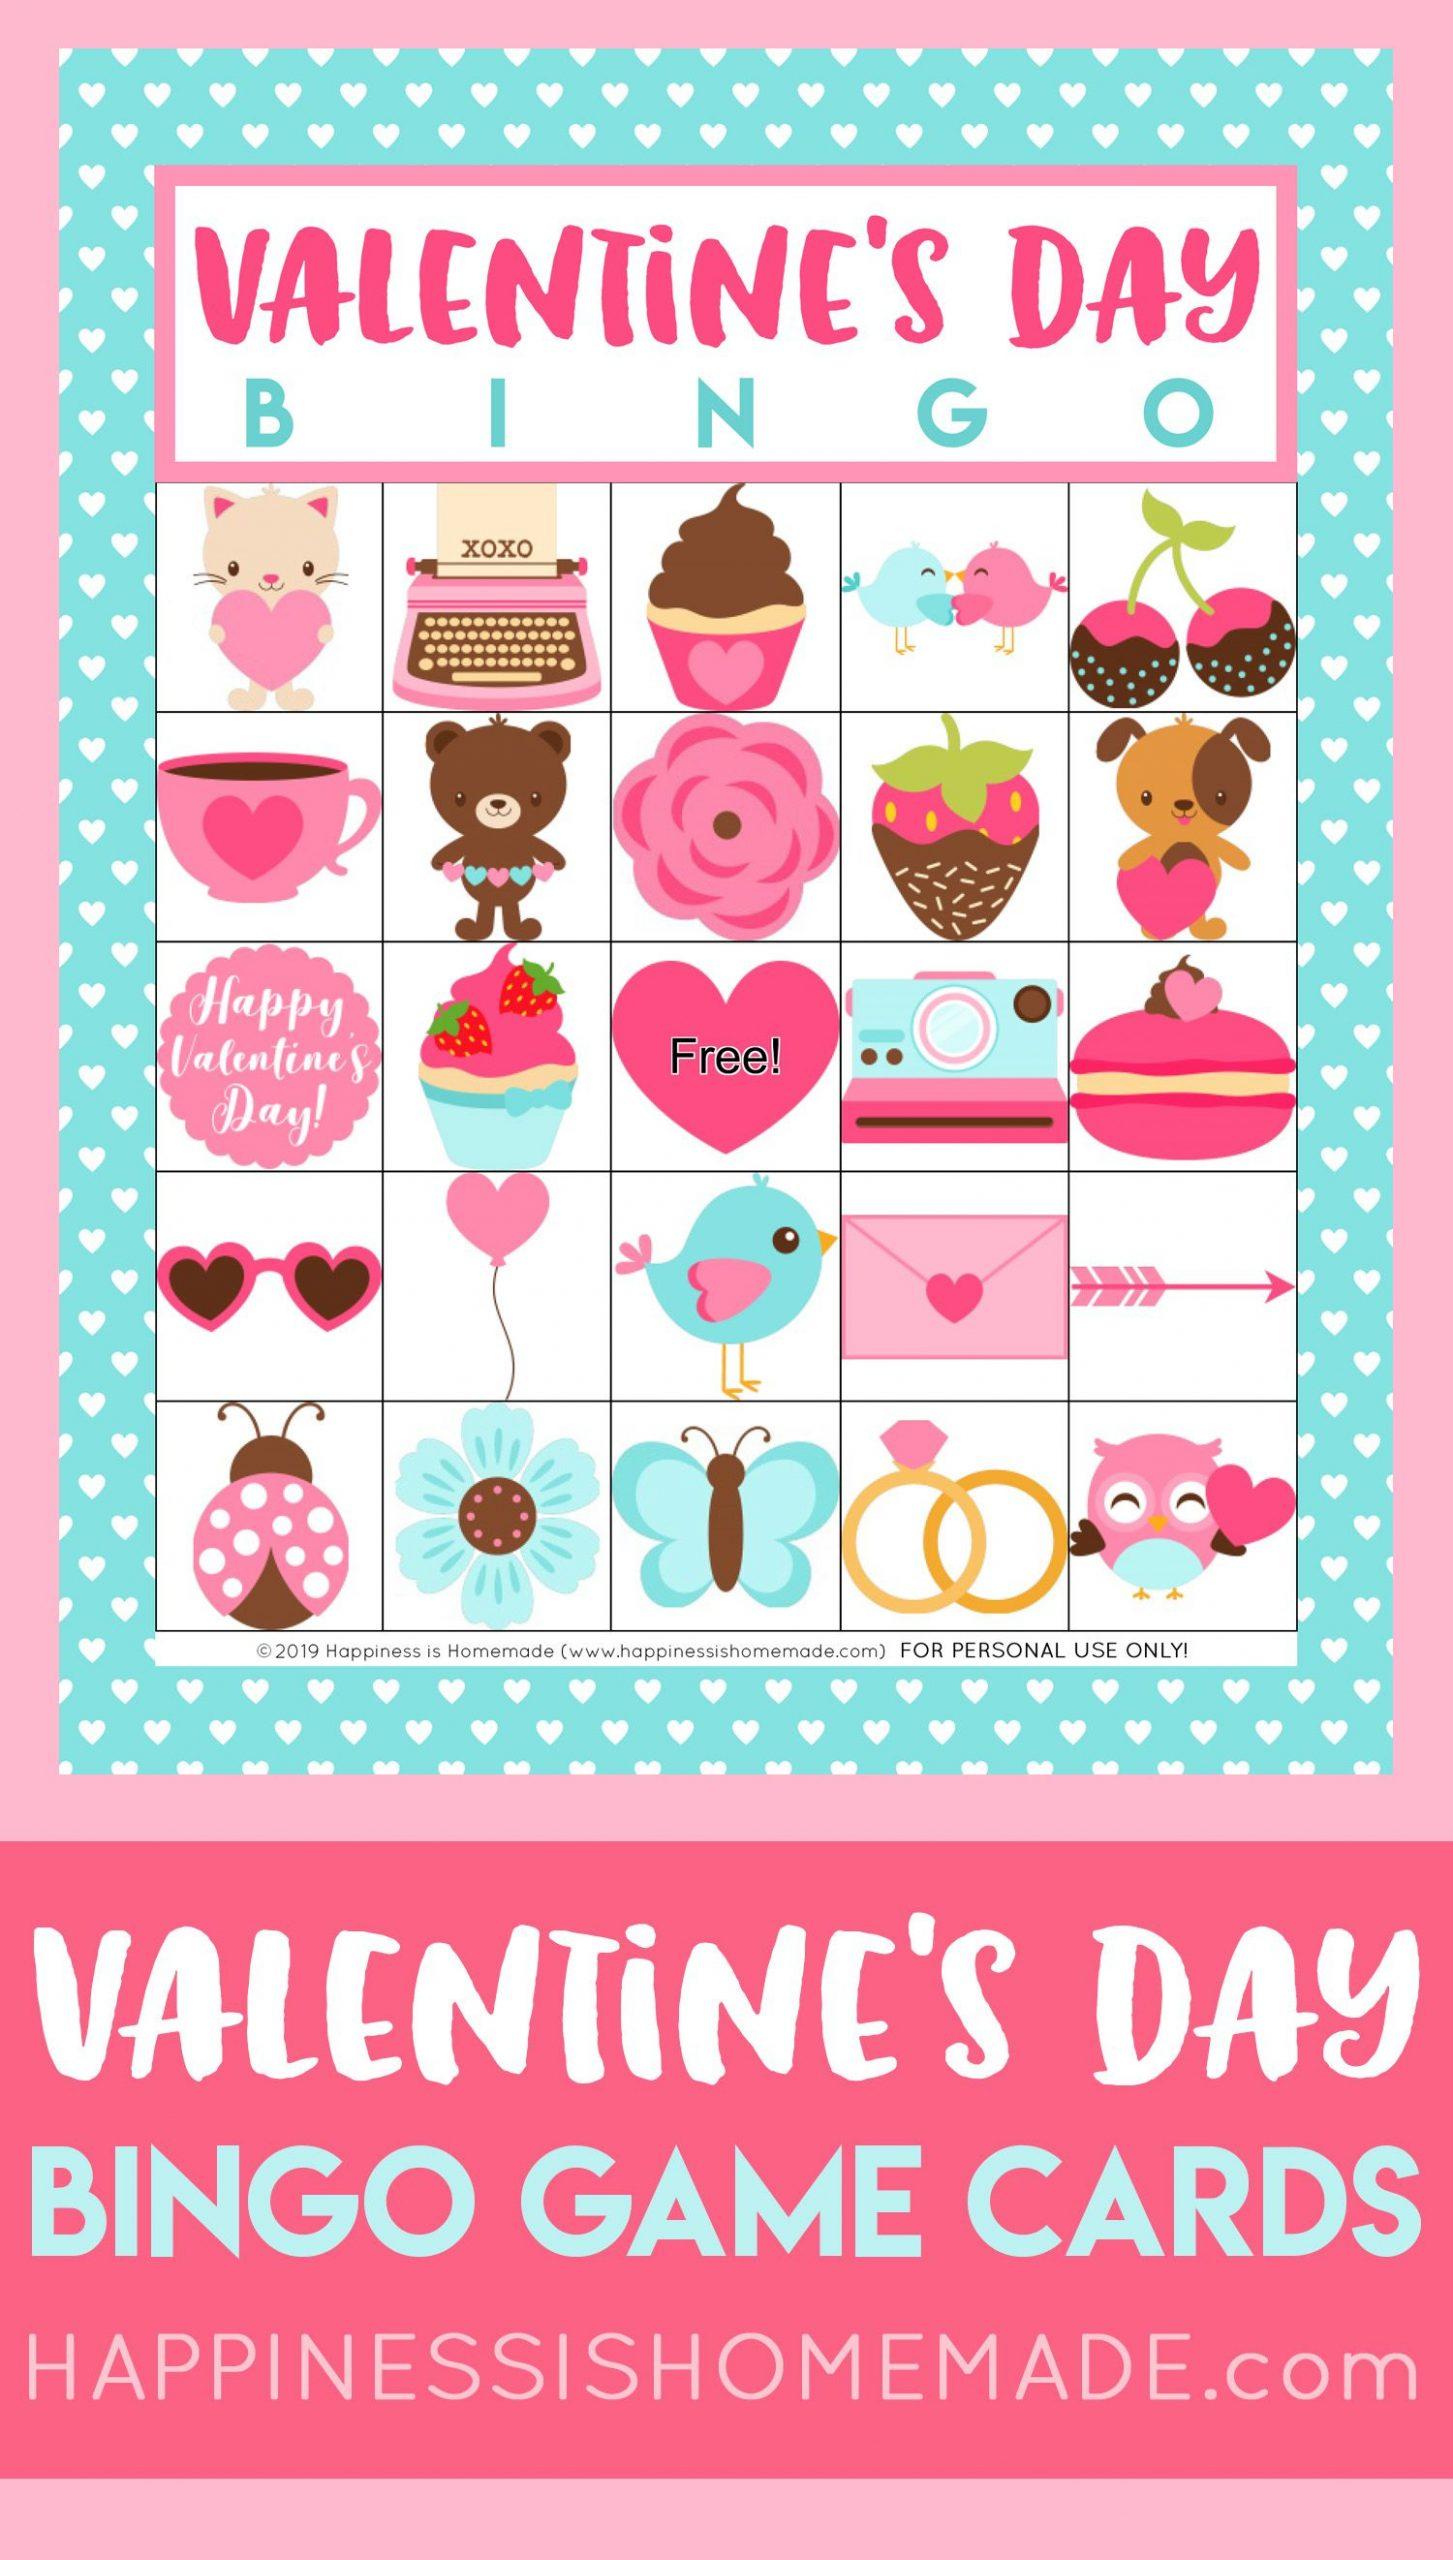 Free Printable Valentine's Day Bingo Cards - Happiness Is